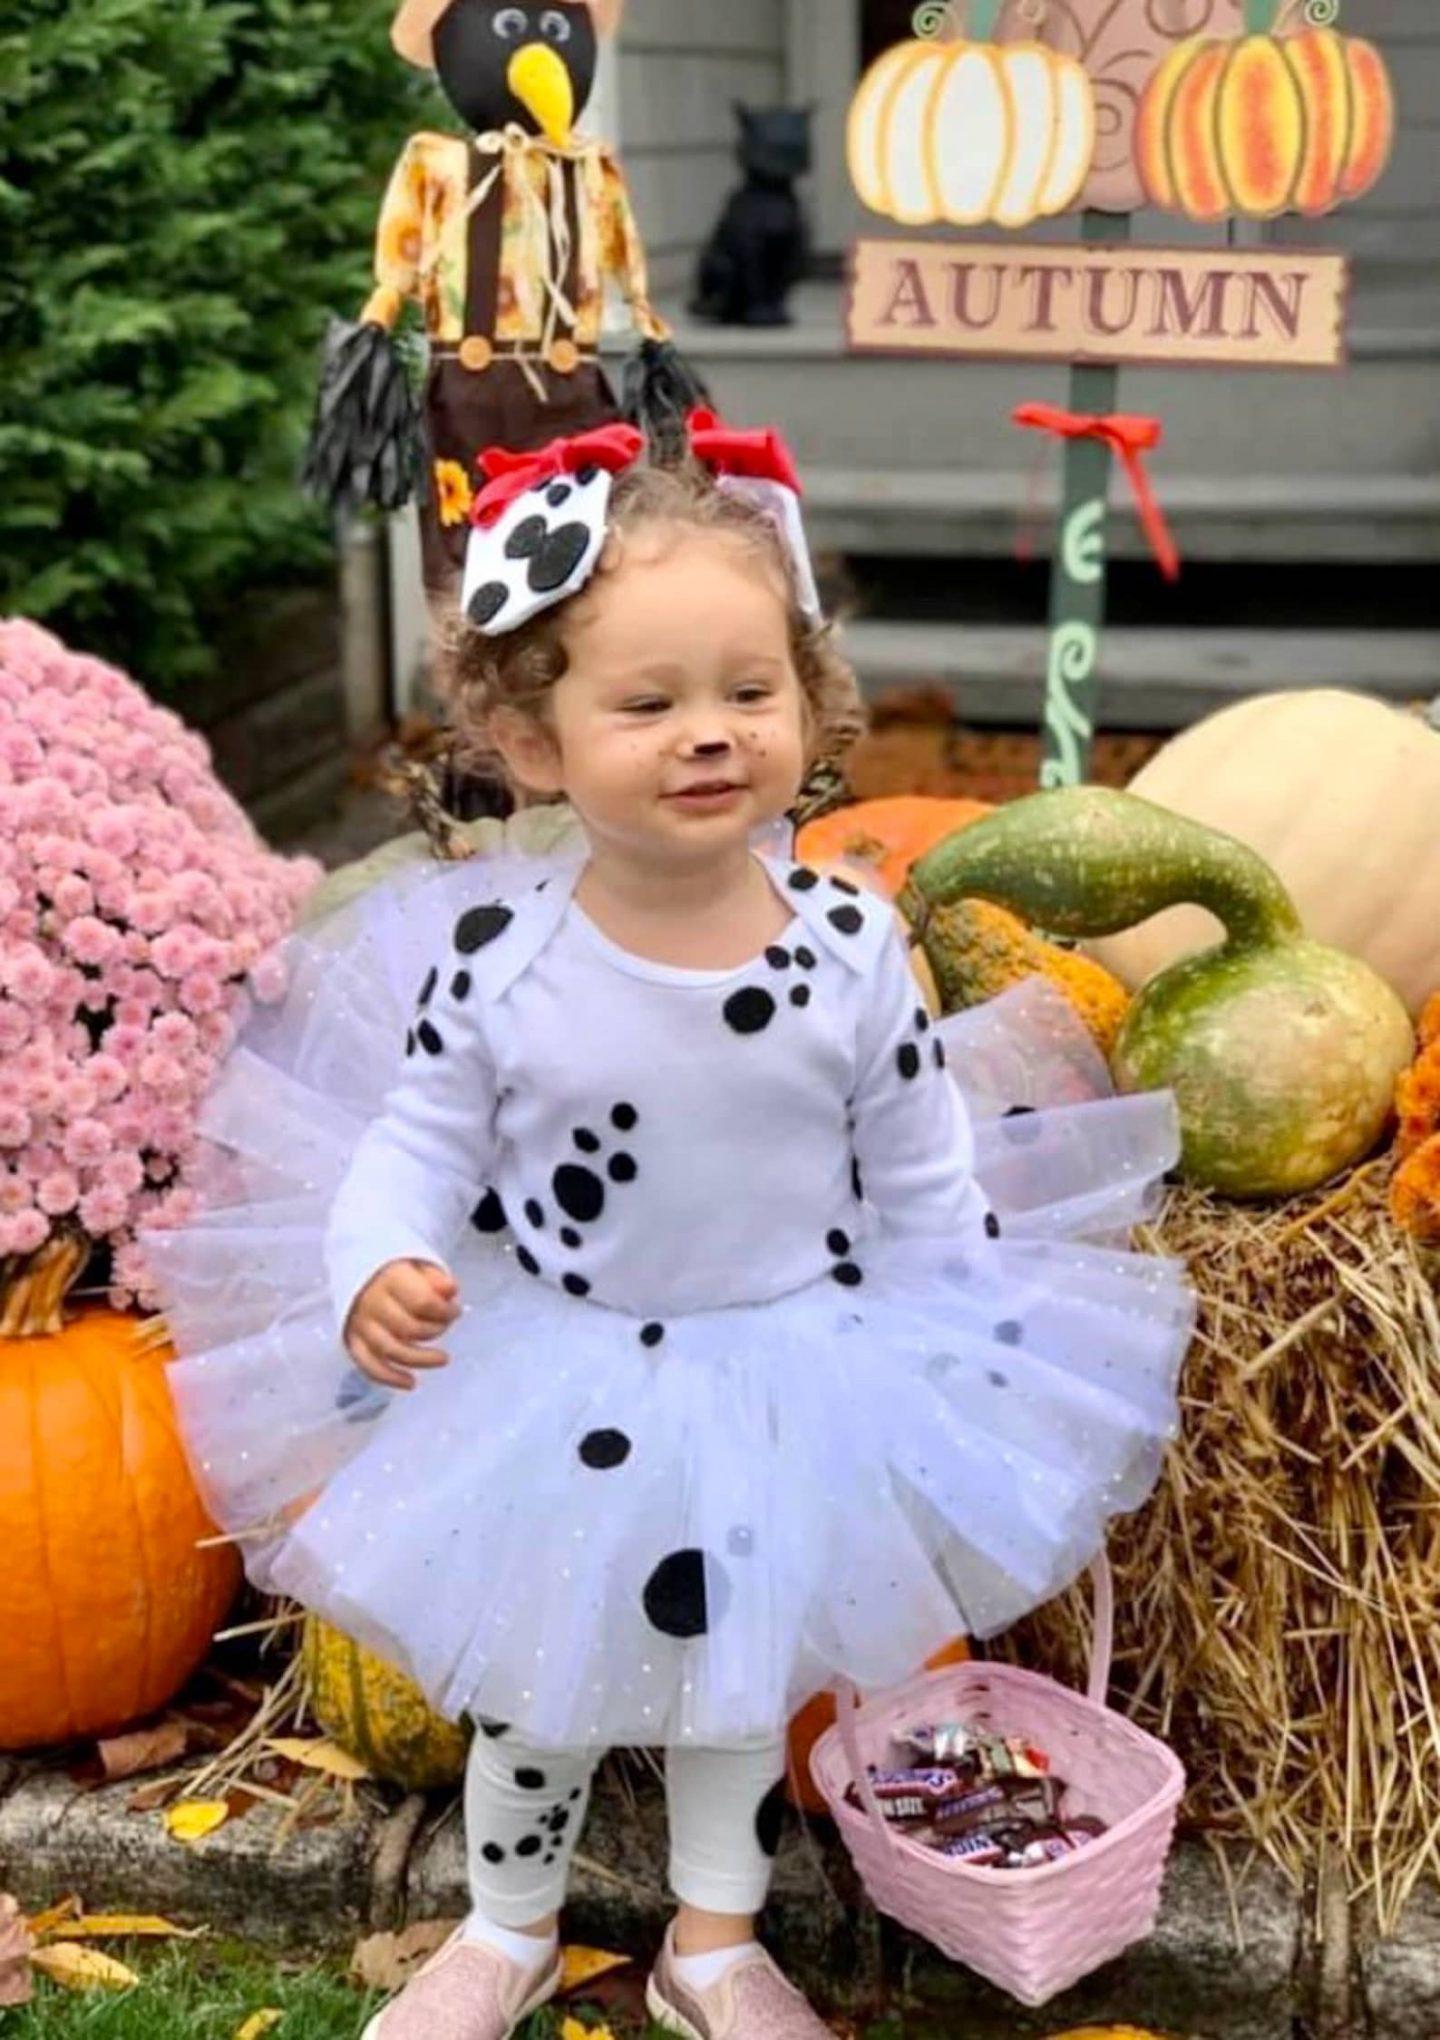 Cute Dalmatian puppy toddler Halloween costume